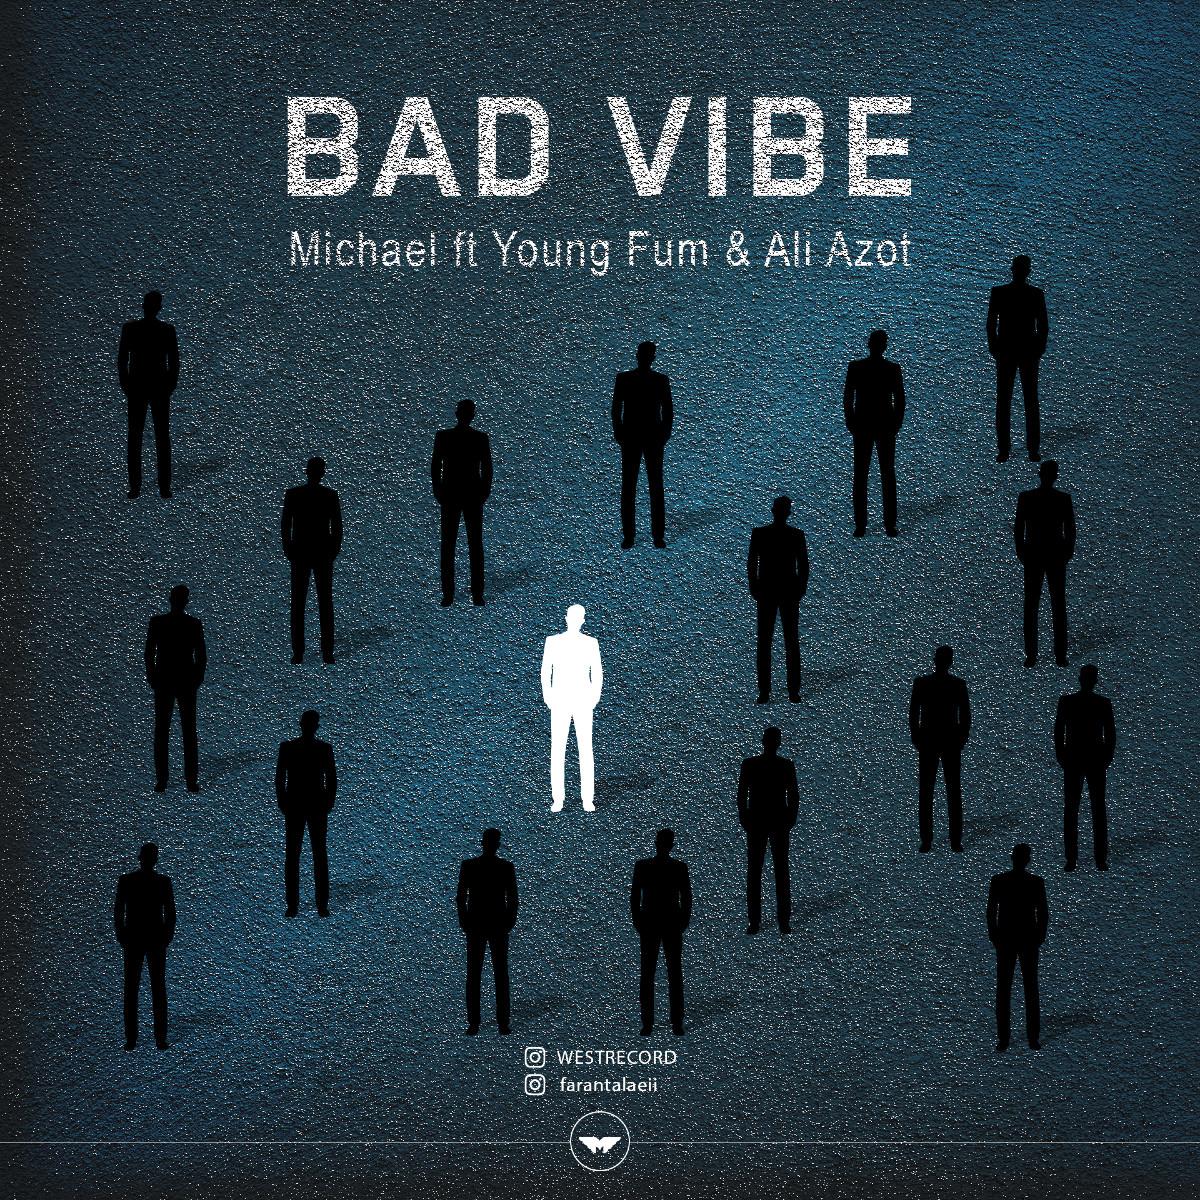 Michael Ft Young Fum & Ali Azot - Bad Vibe